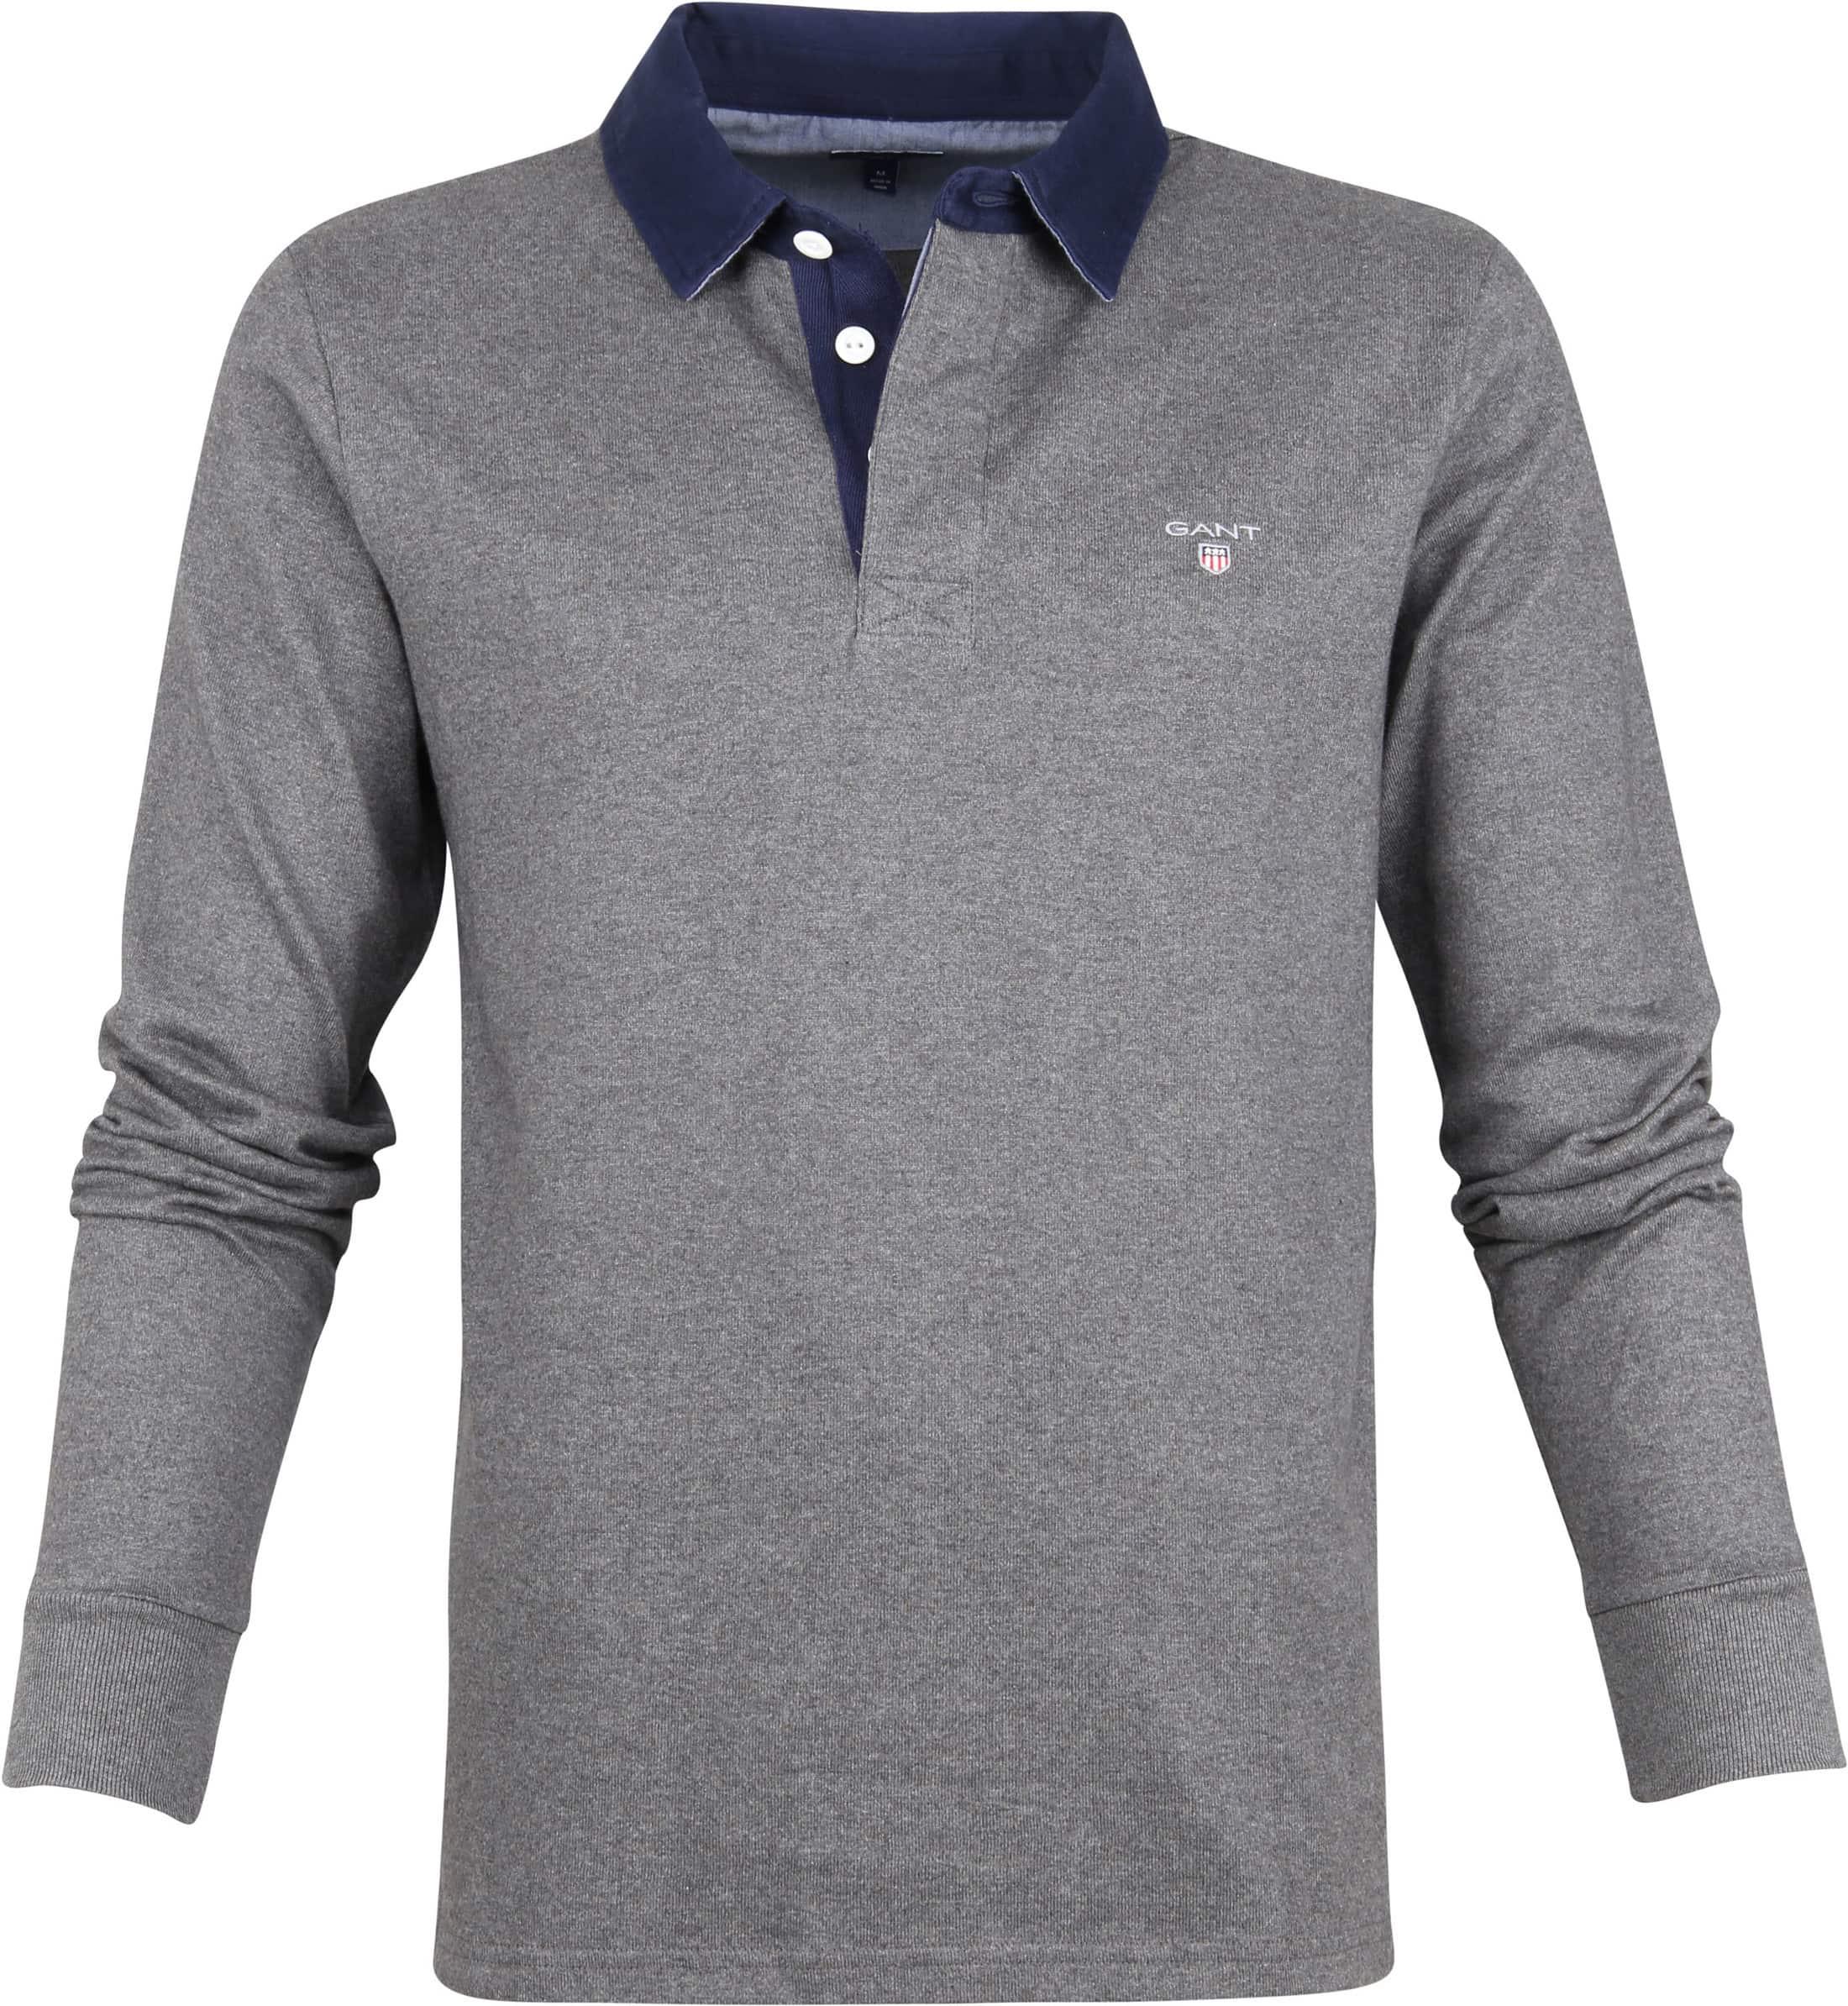 Gant Rugger Poloshirt LS Antraciet foto 0